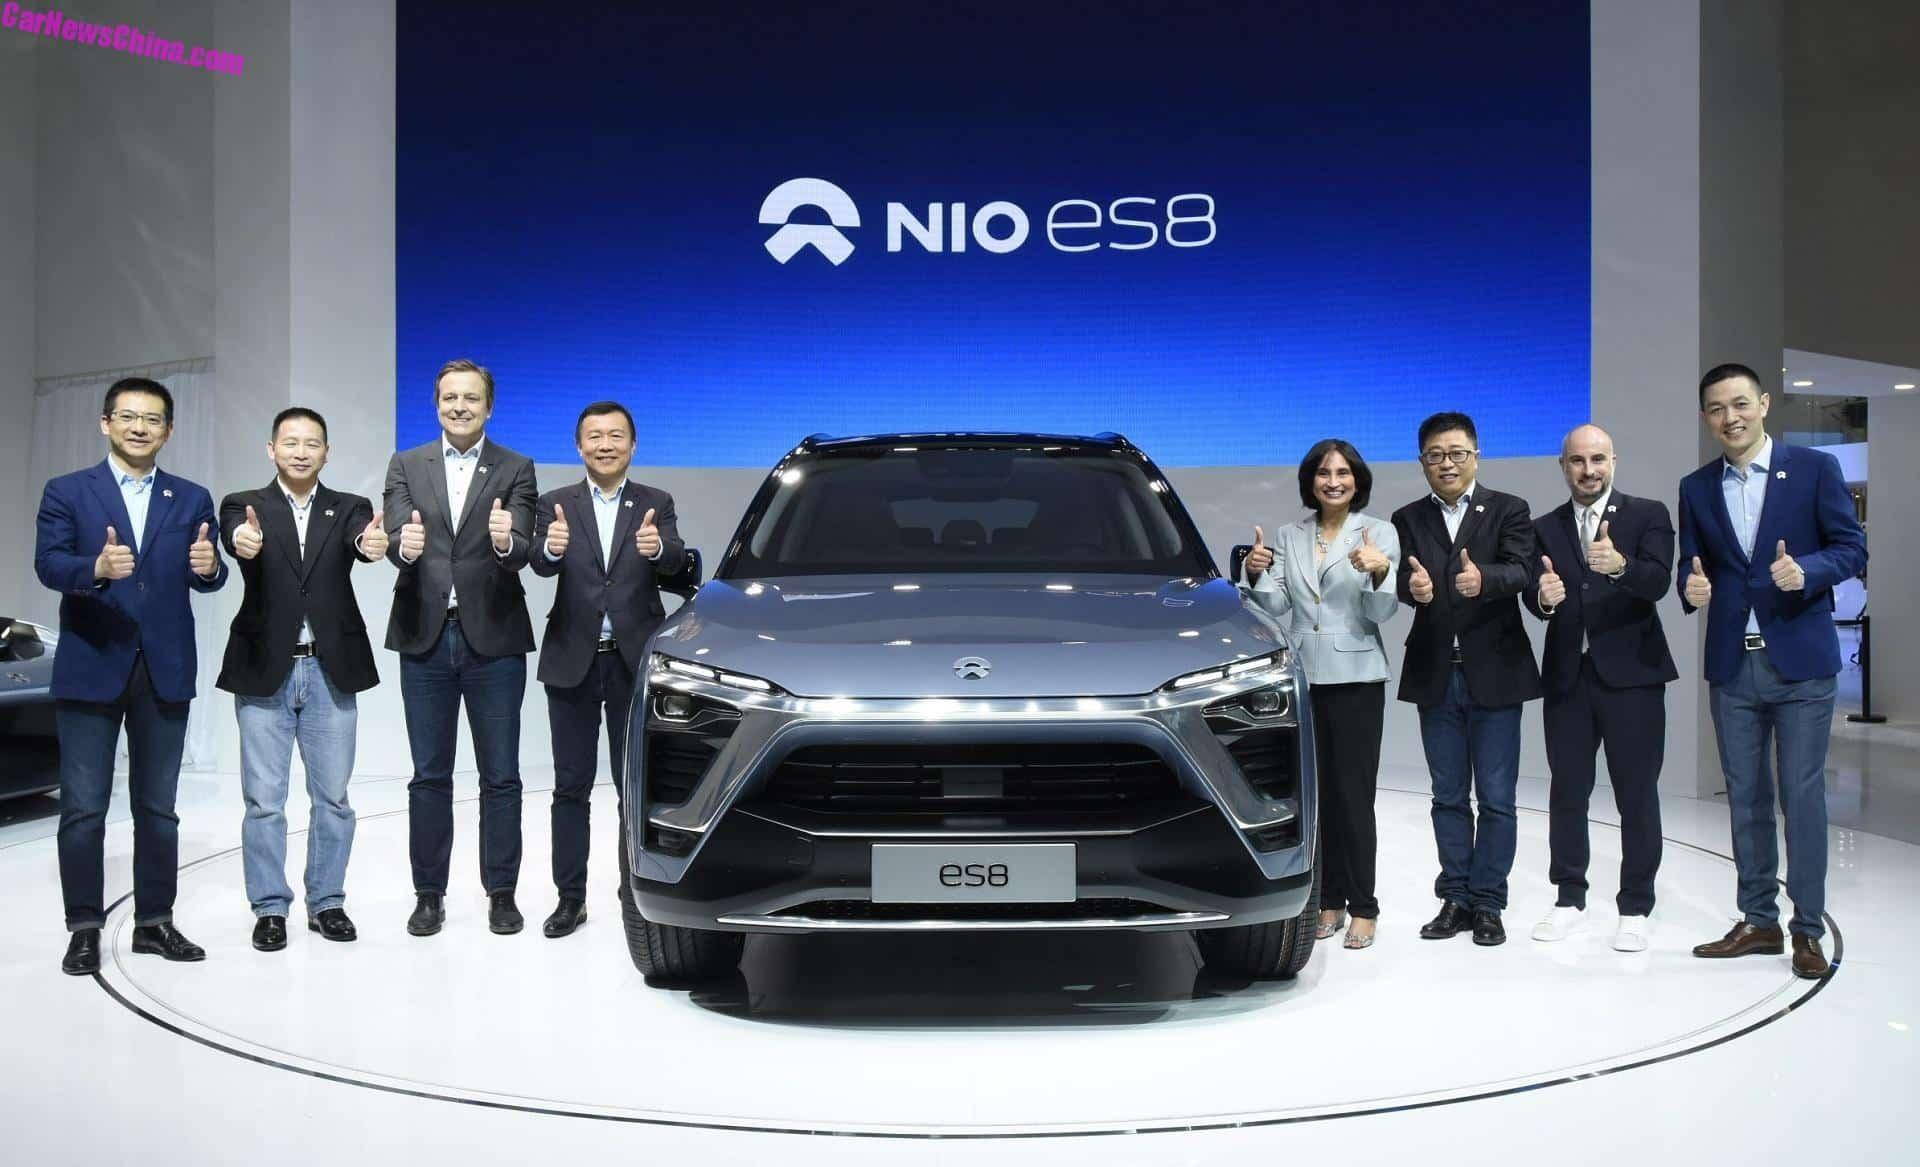 china car news archives - carnewschina